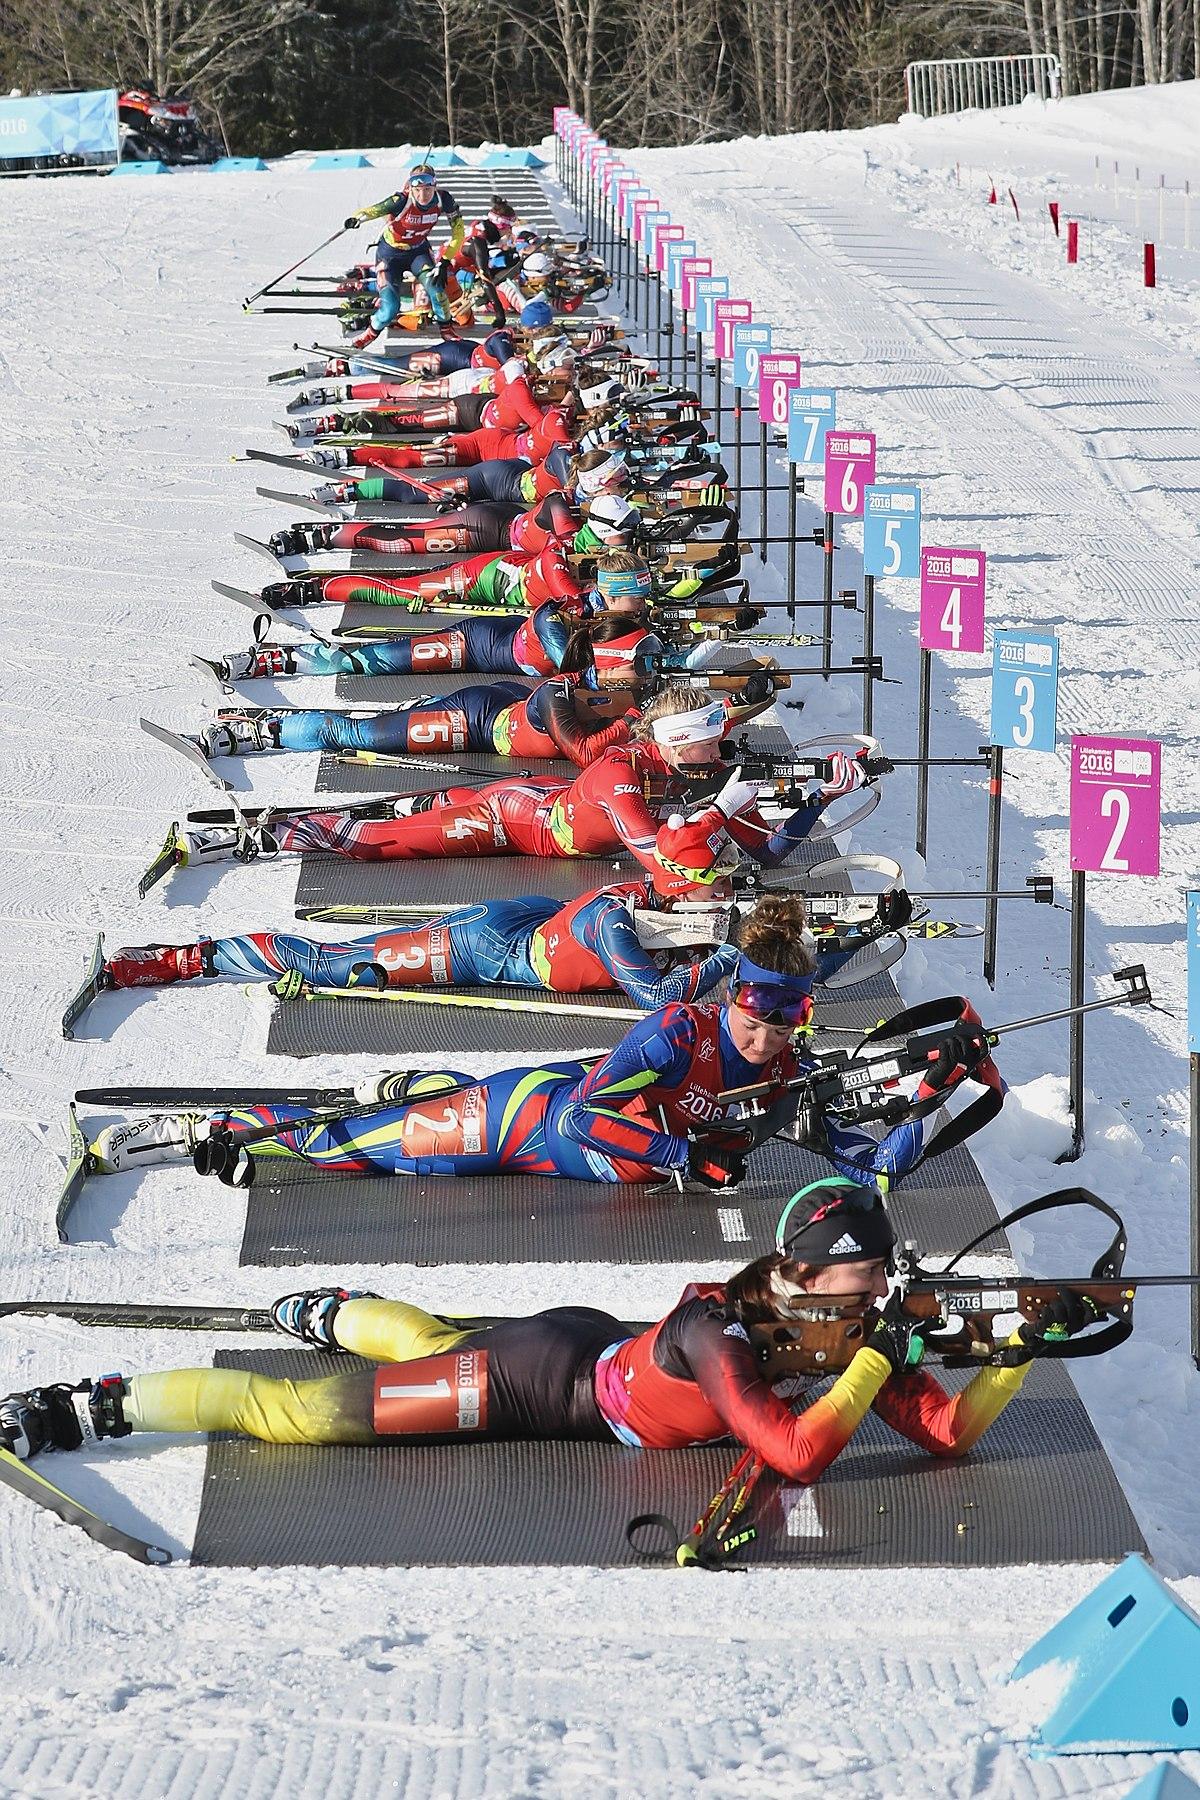 Biathlon at the 2016 Winter Youth Olympics - Wikipedia